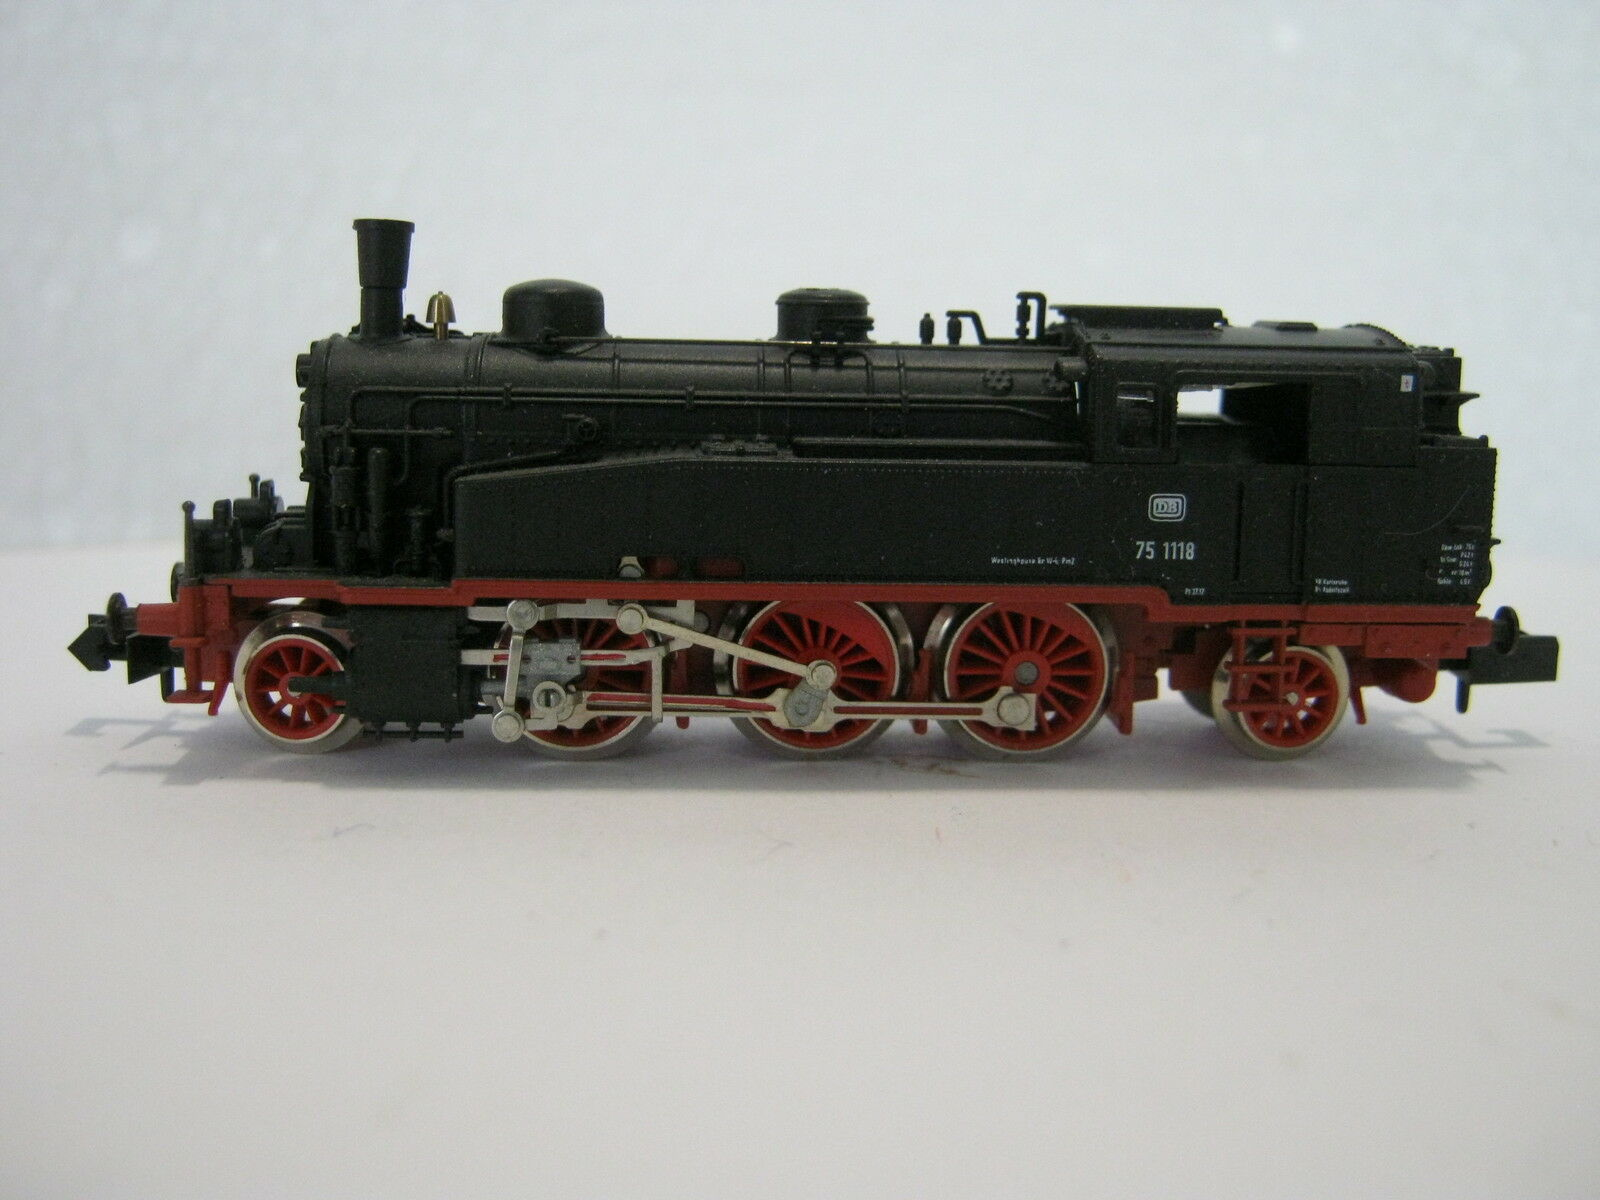 Arnold N 2212 Dampf Lok BR 75 1118 DB (RG RS 056-62S4 27)